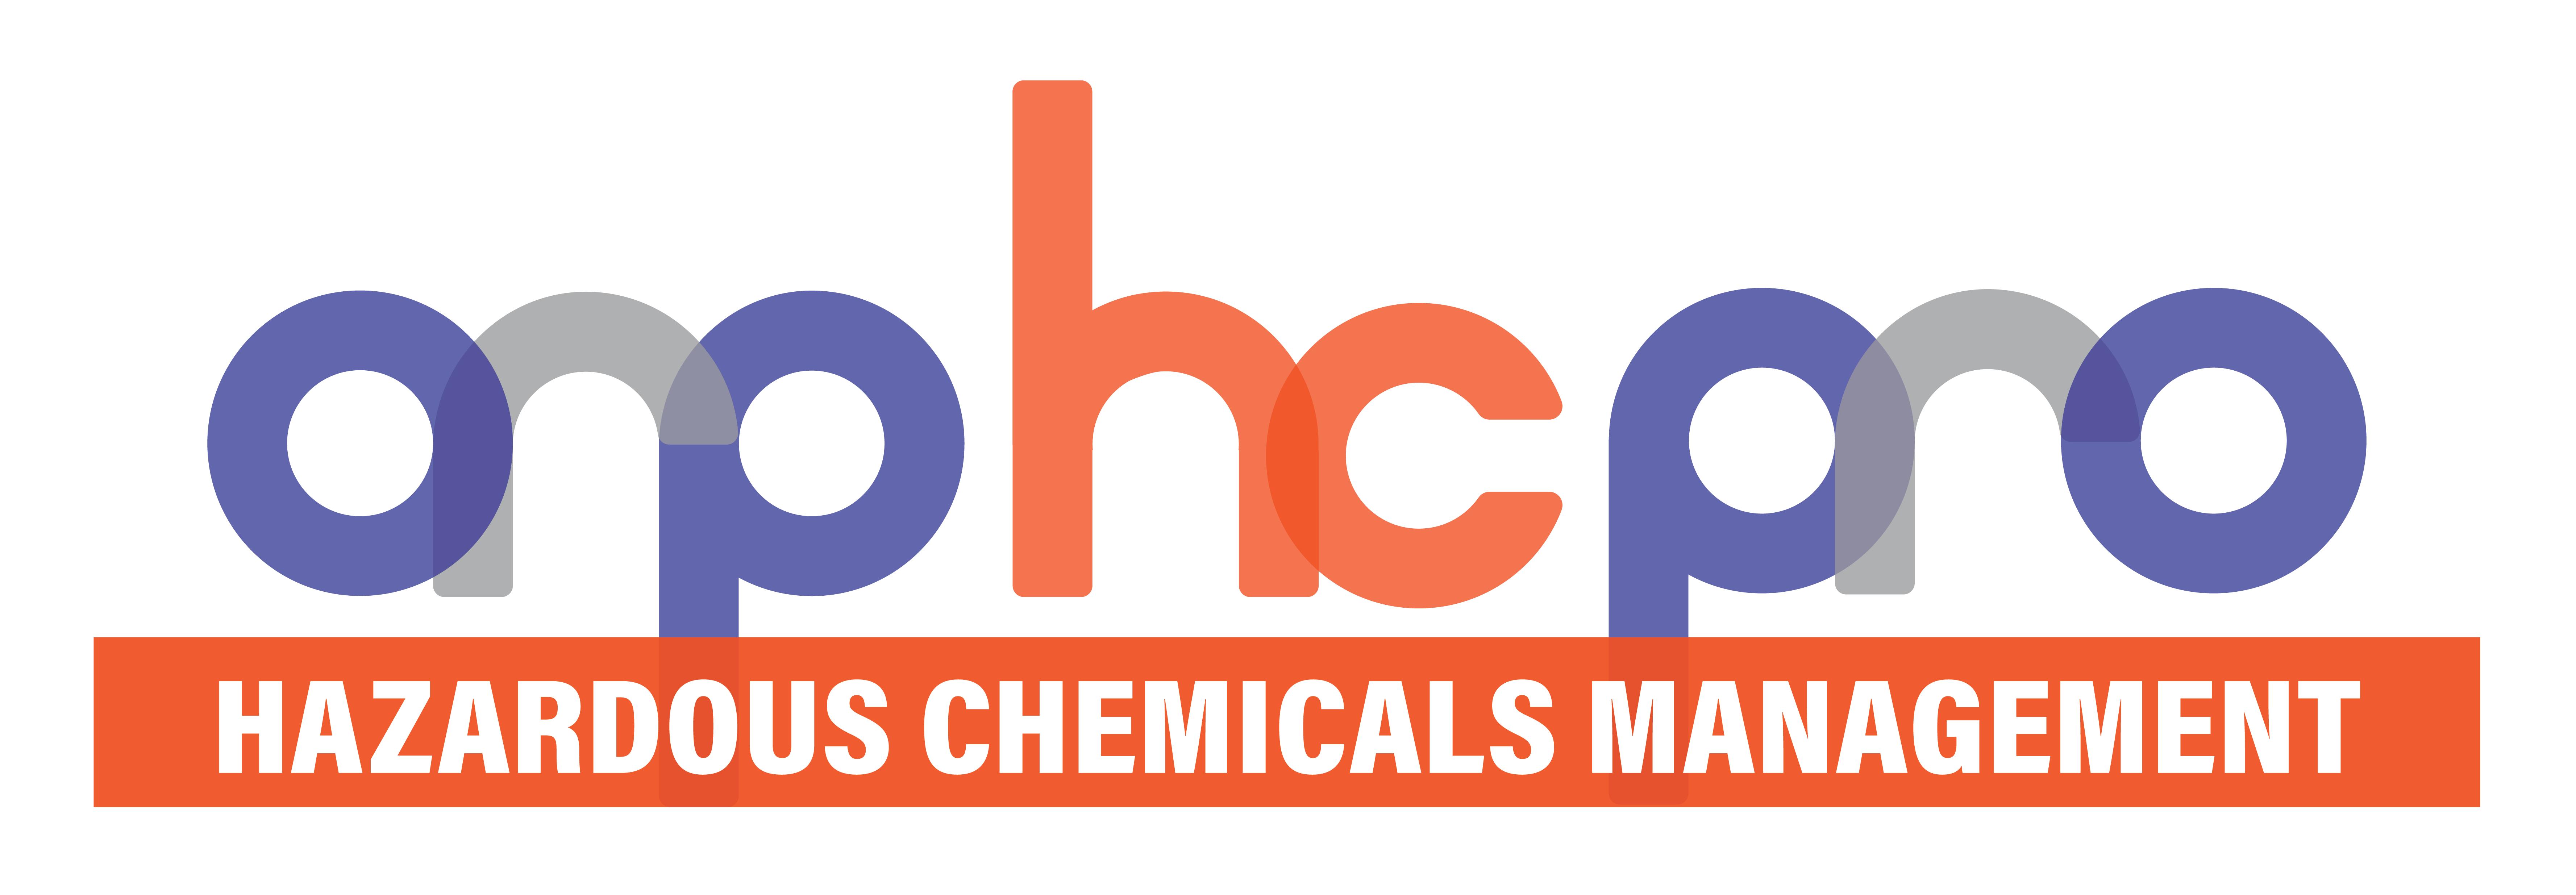 Hazardous chemicals management